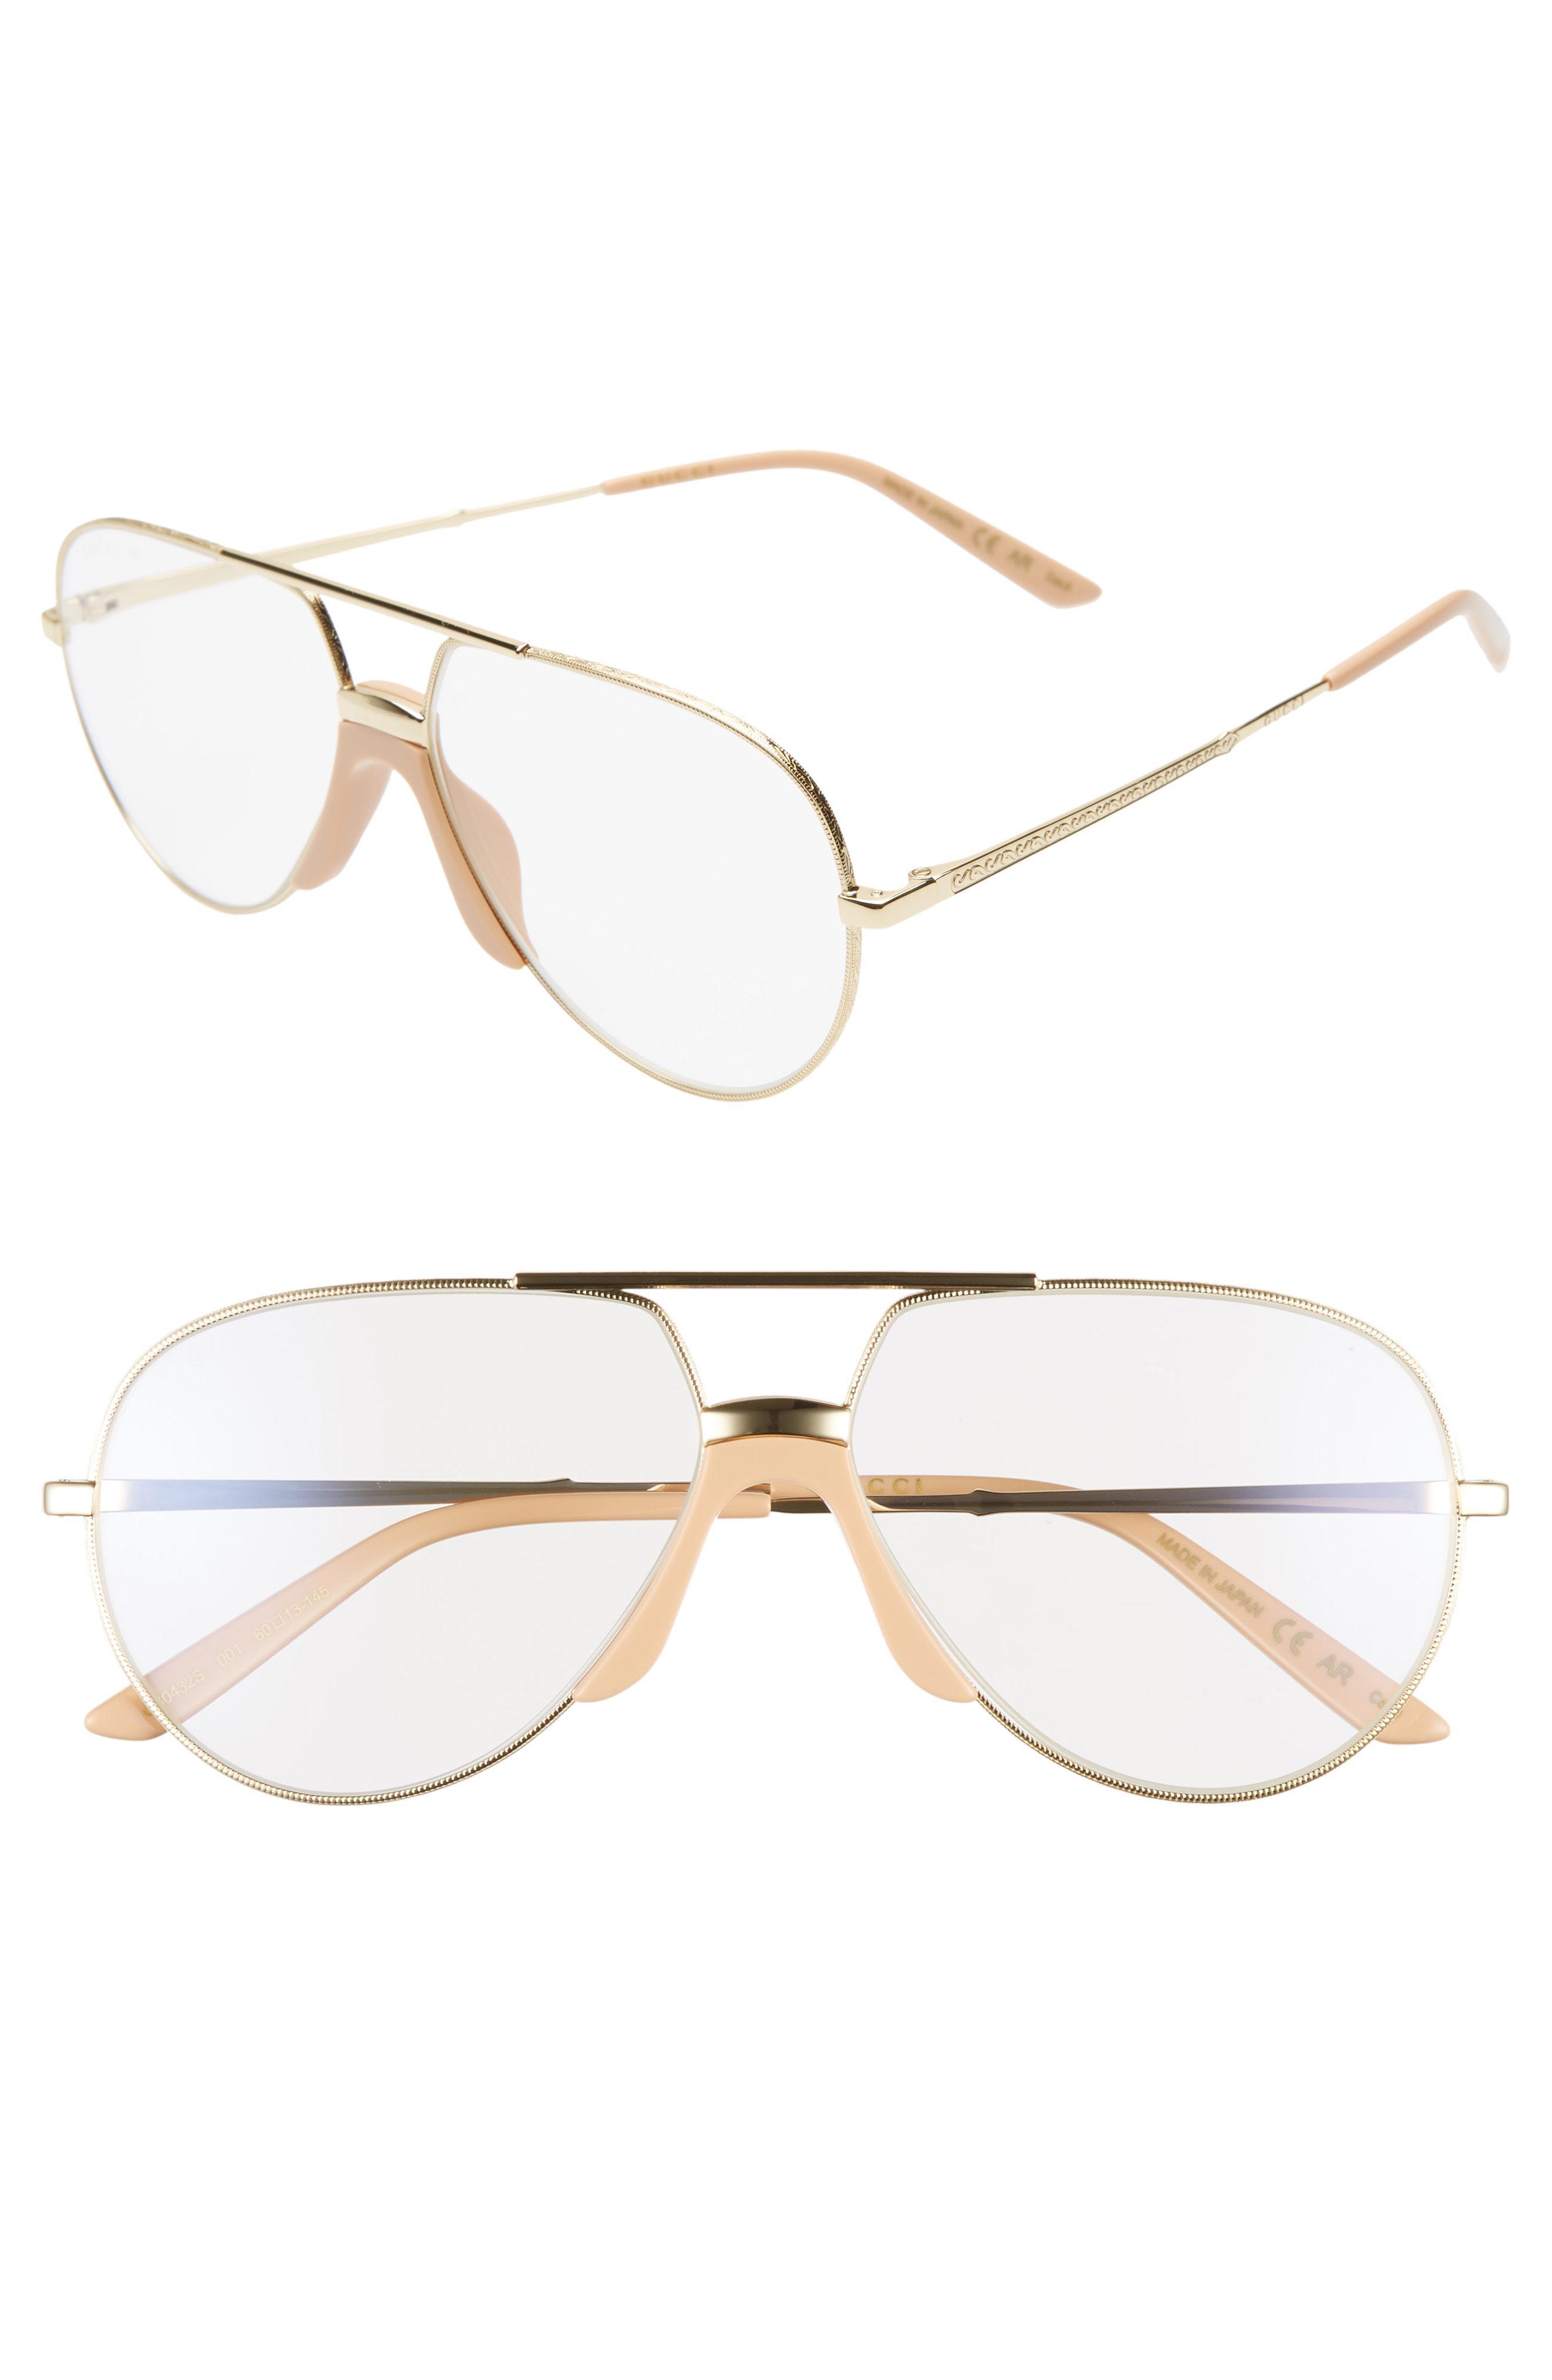 0ad22830eb1 Gucci. Women s 60mm Antireflective Aviator Sunglasses -